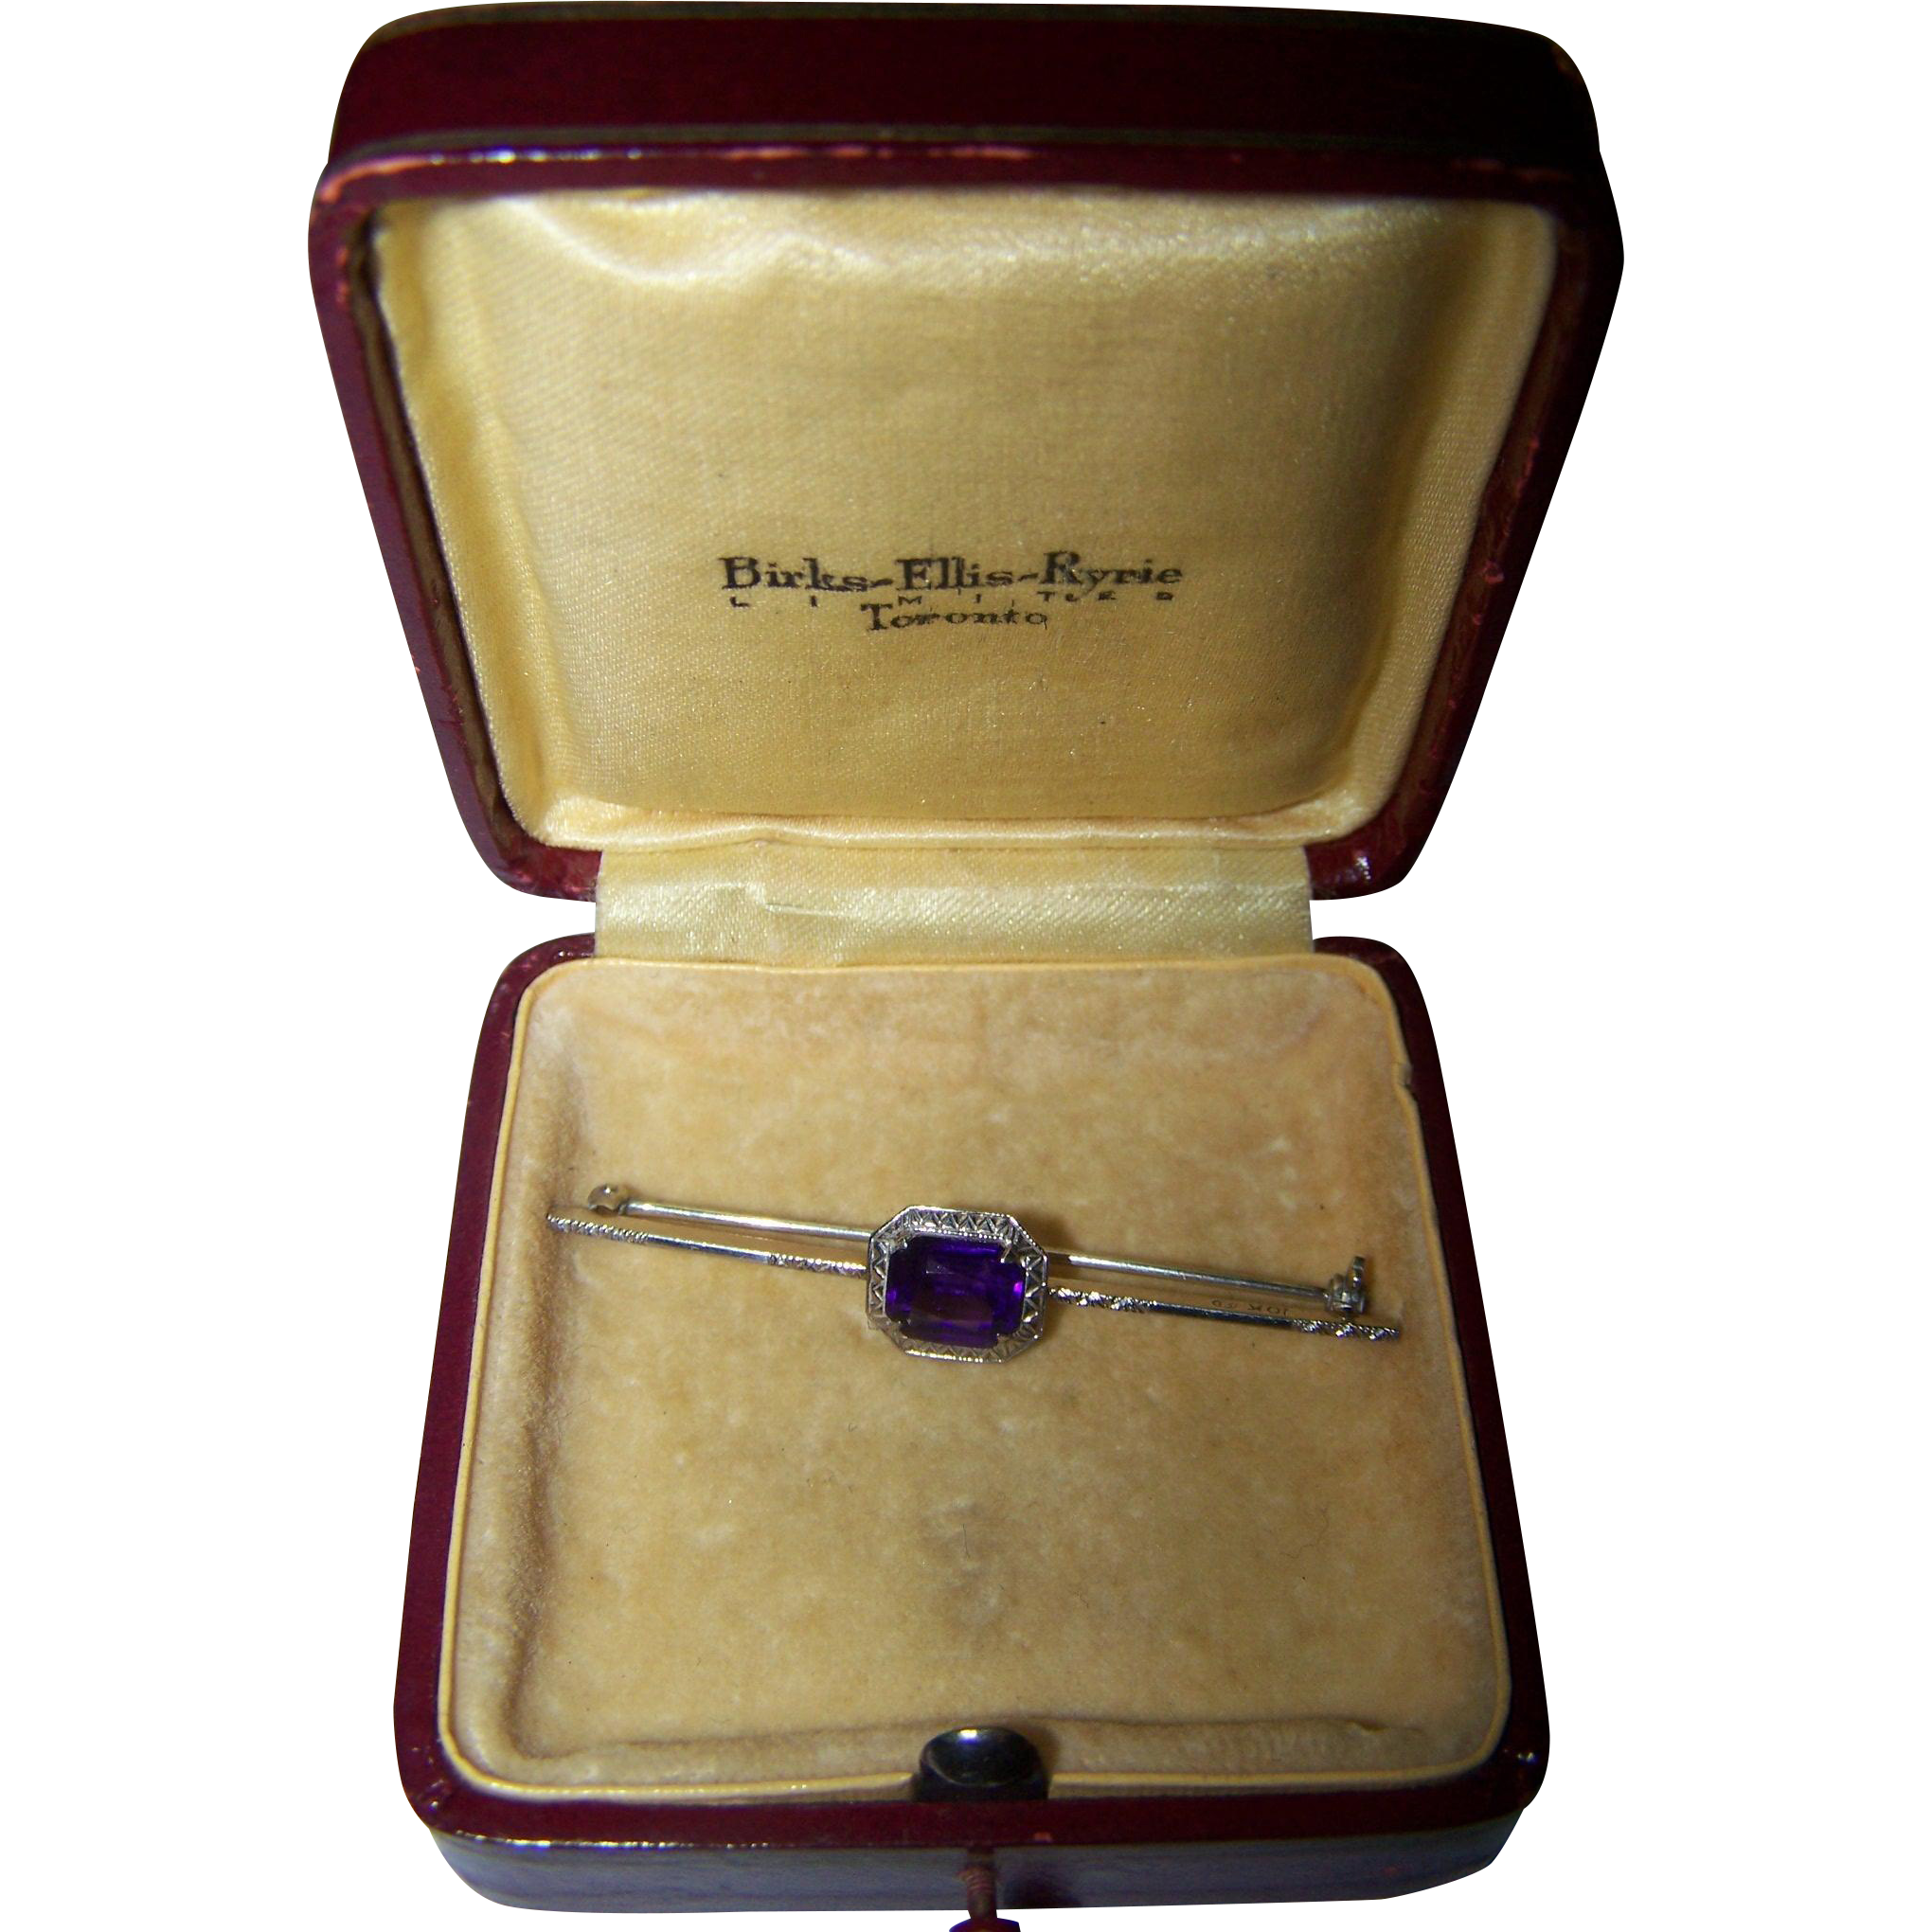 A Vintage Purple Amethyst 10 K White Gold Bar Pin In Original BIRKS Box